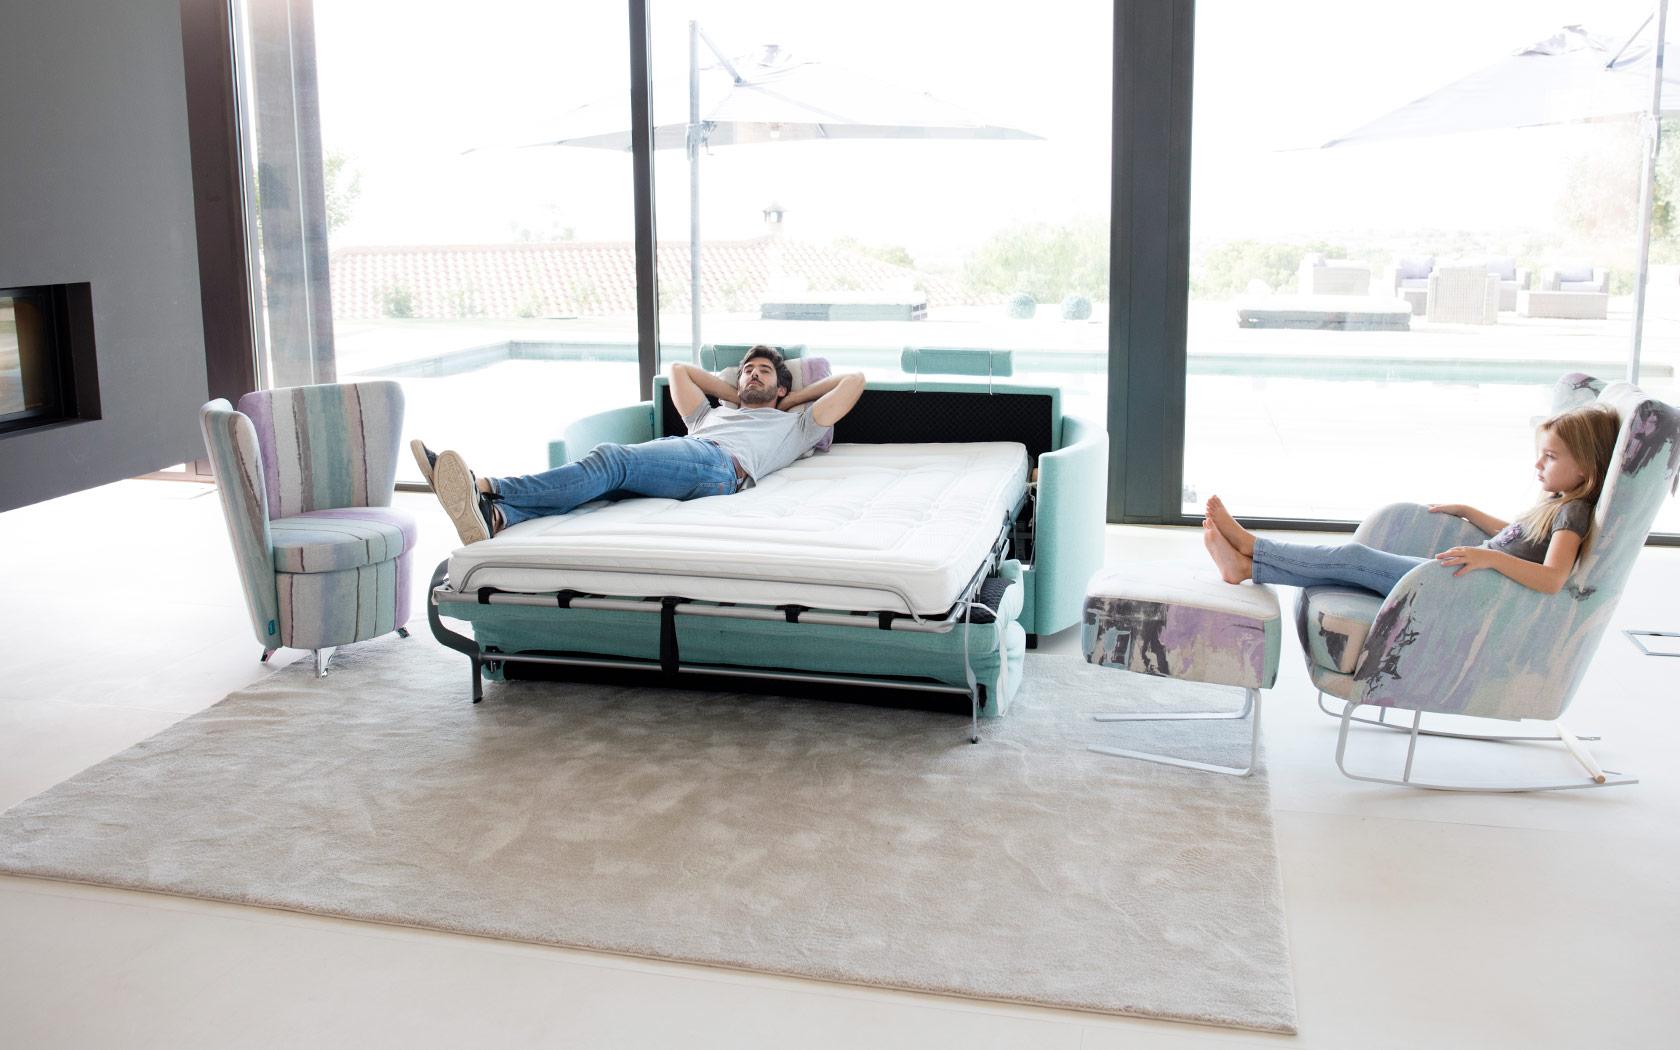 Bolero sofa cama 2019 05